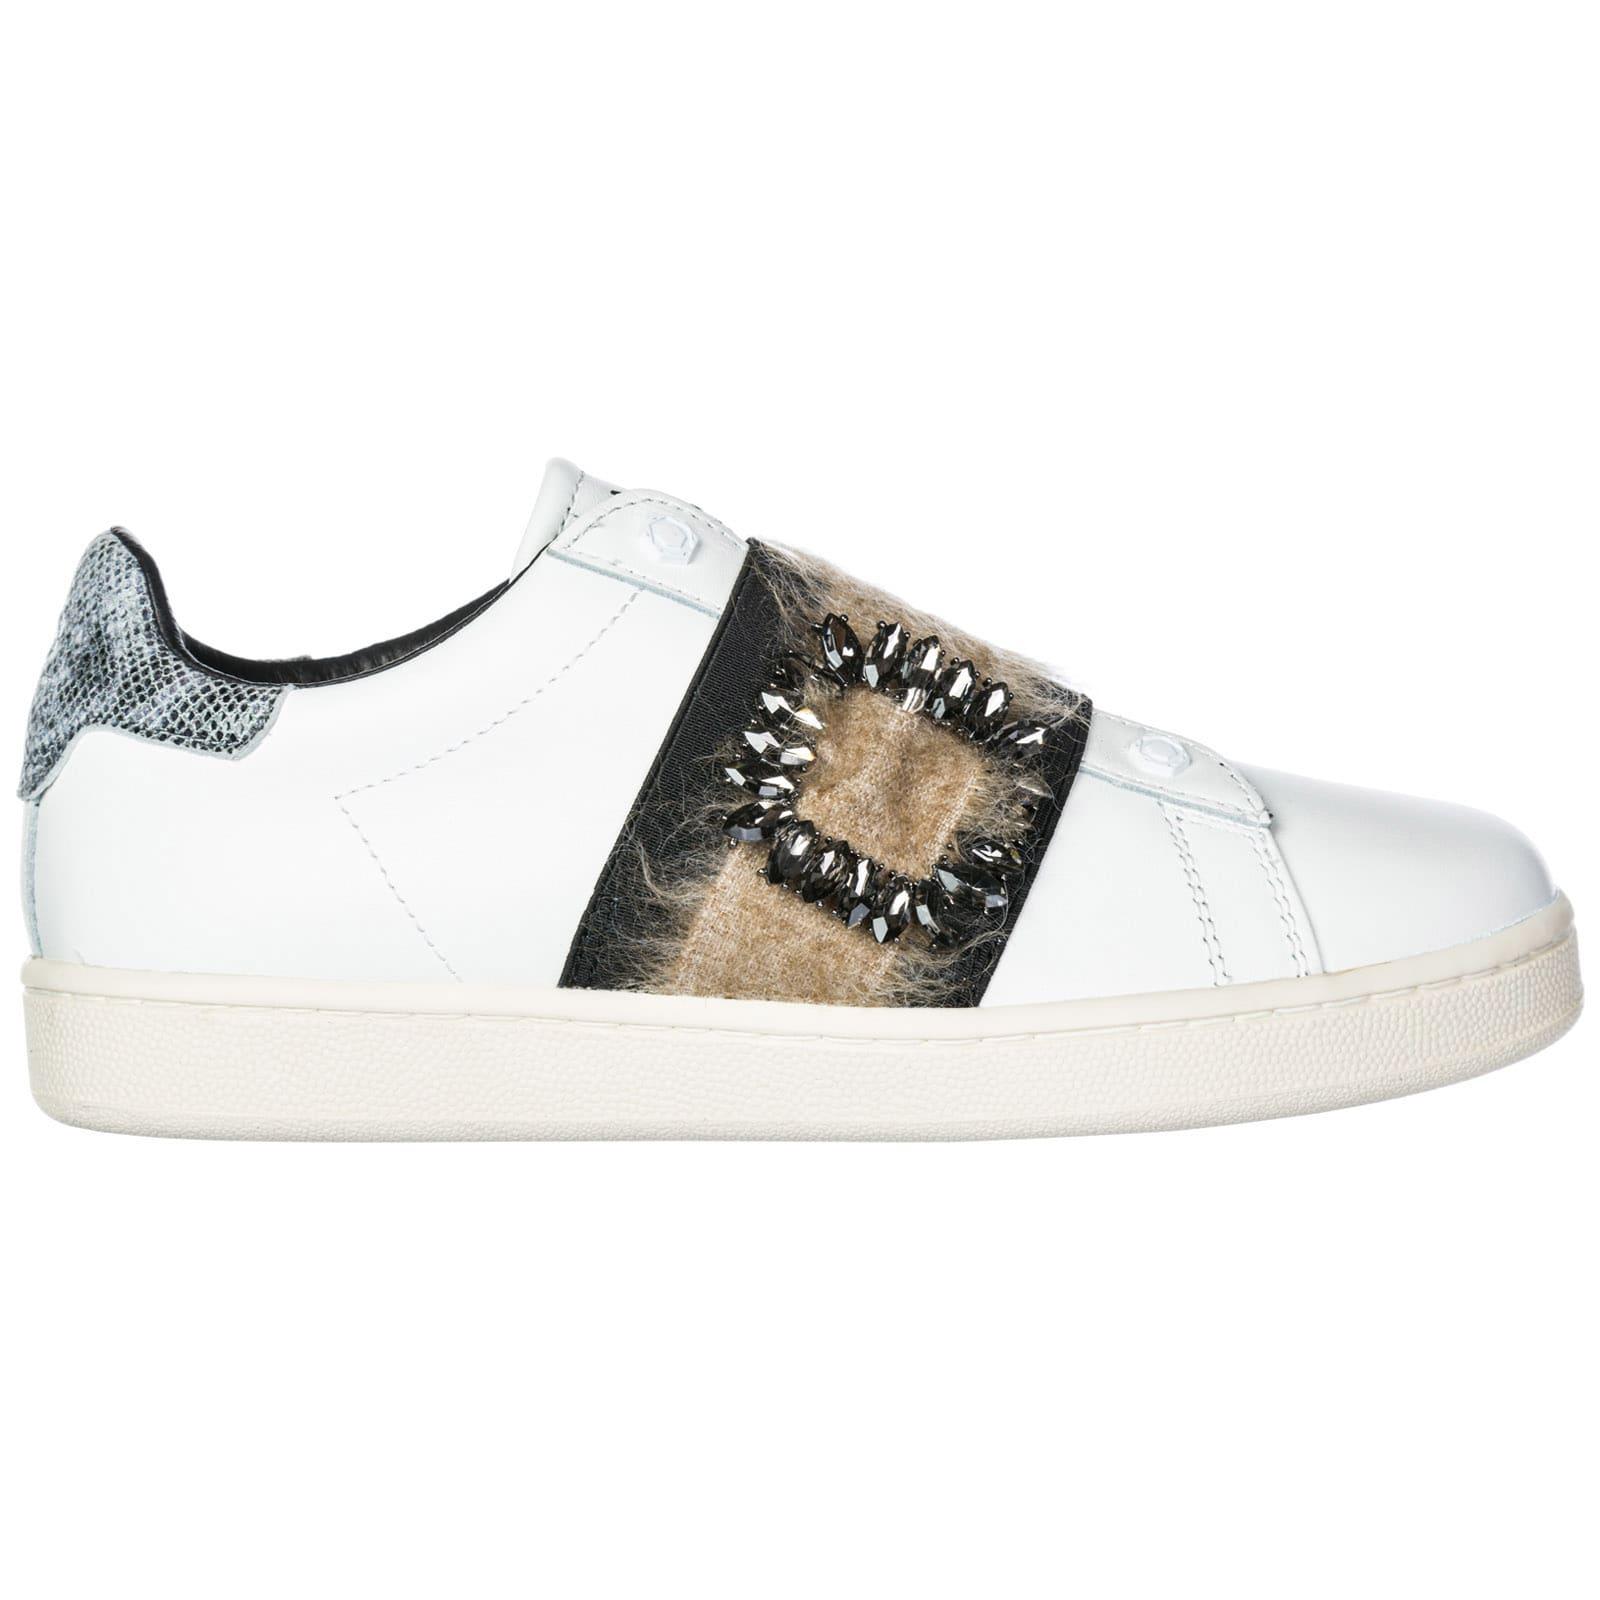 Gallery Diamond Slip-on Shoes